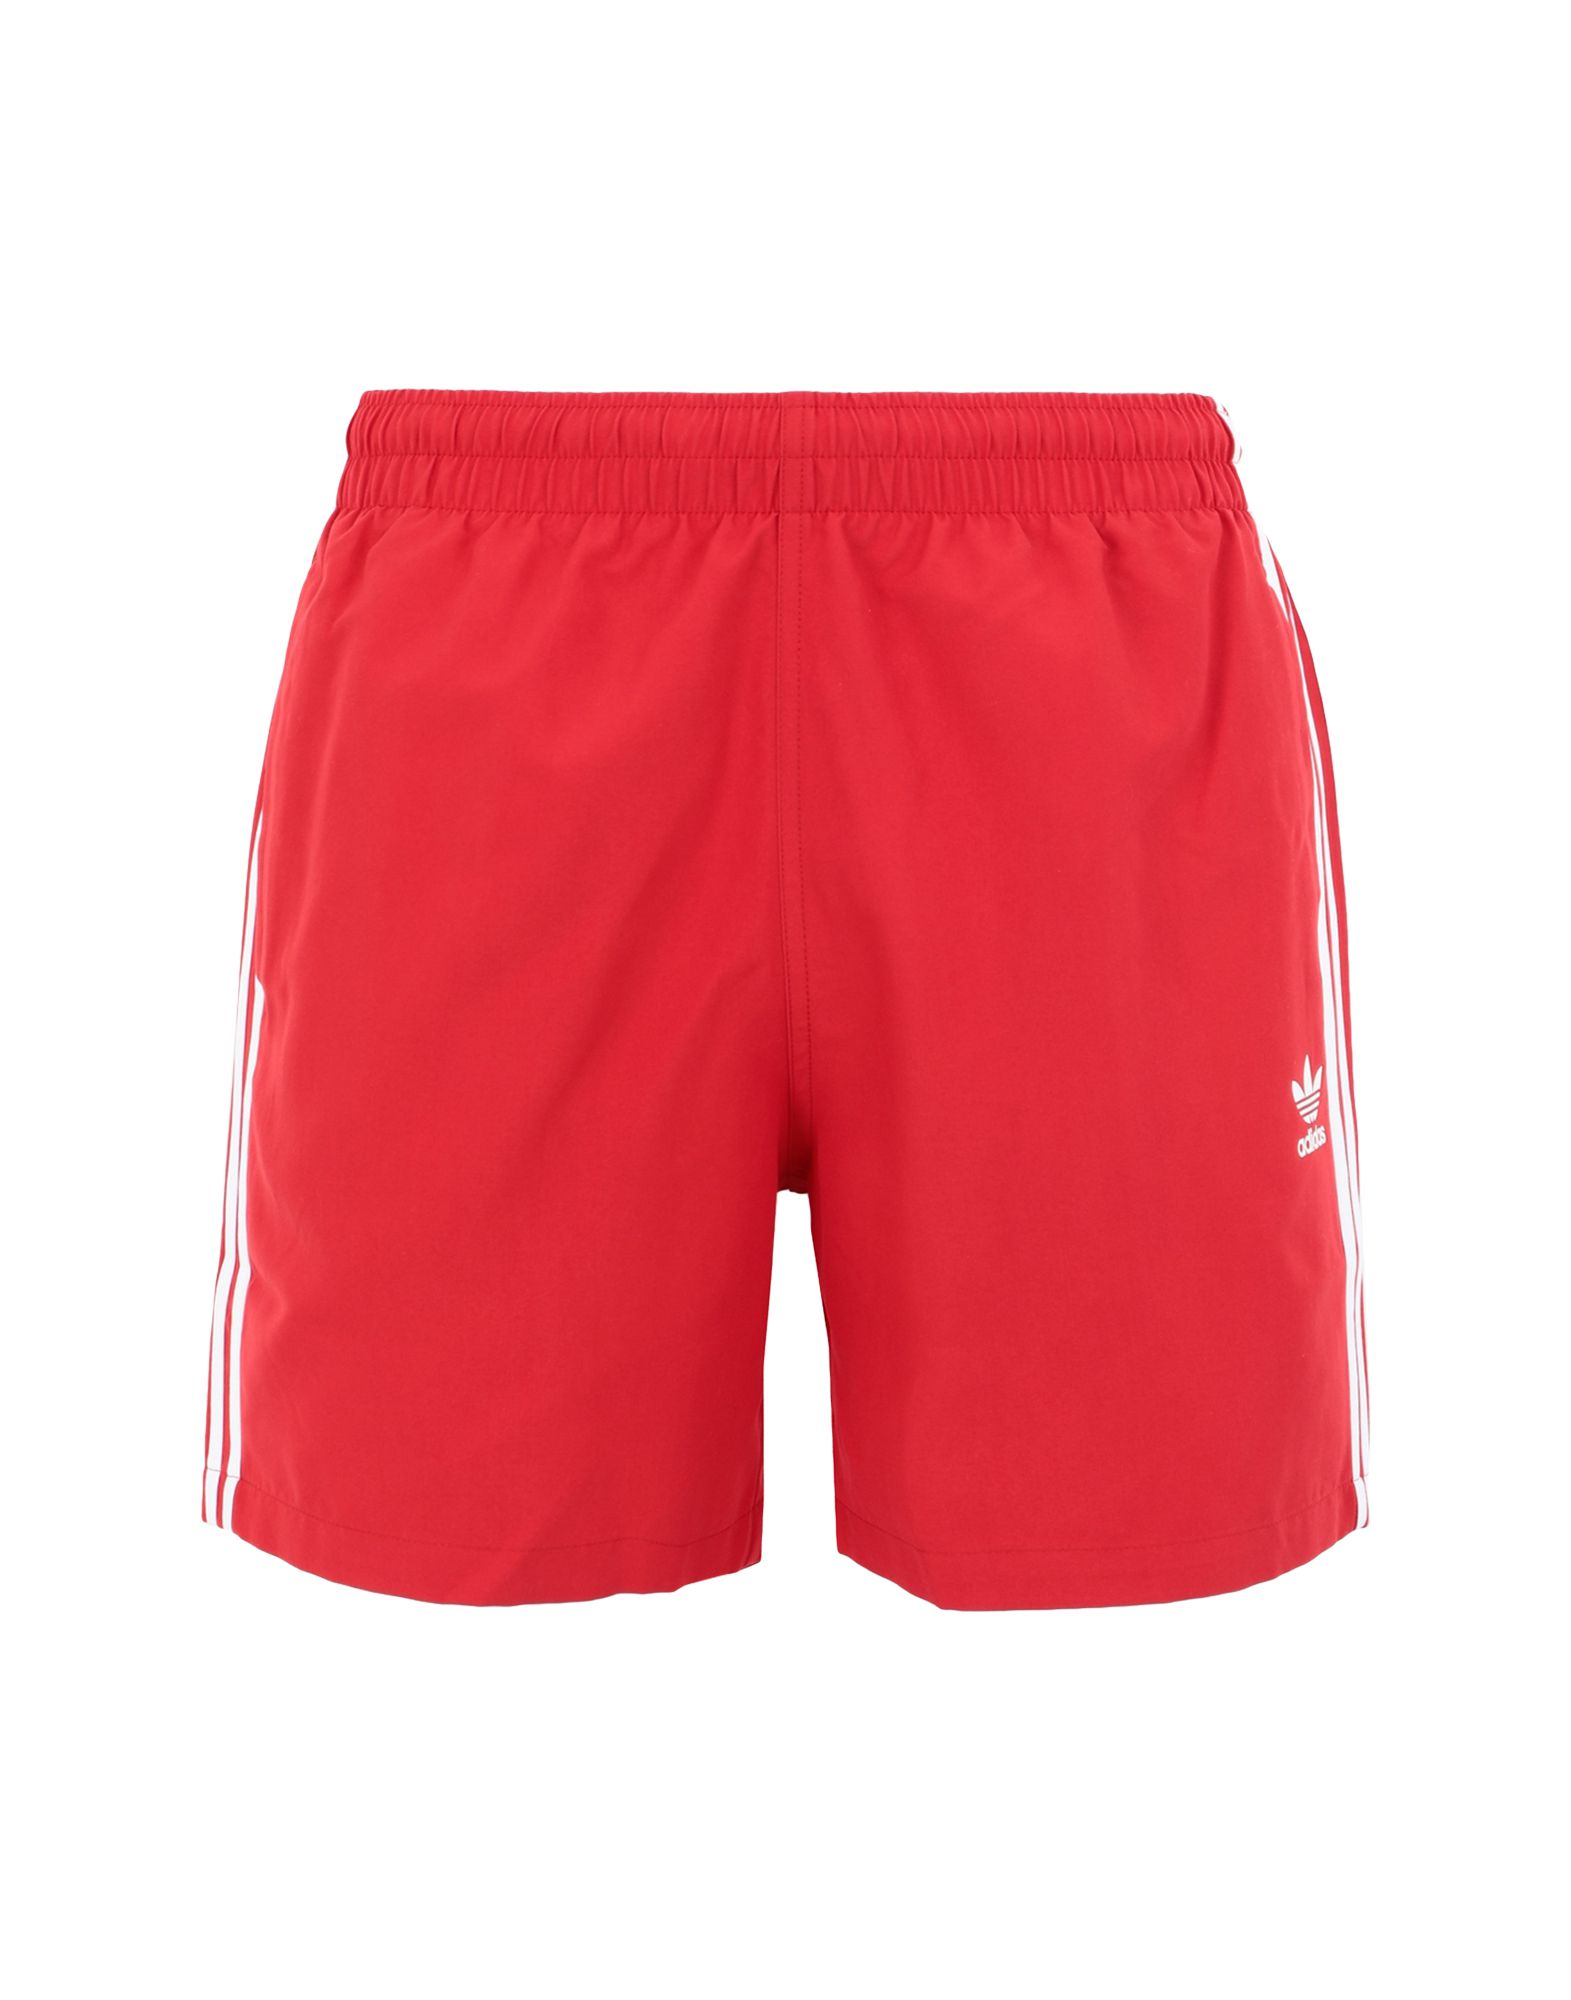 Фото - ADIDAS ORIGINALS Шорты для плавания adidas шорты мужские adidas 3 stripes 9 inch размер 44 46